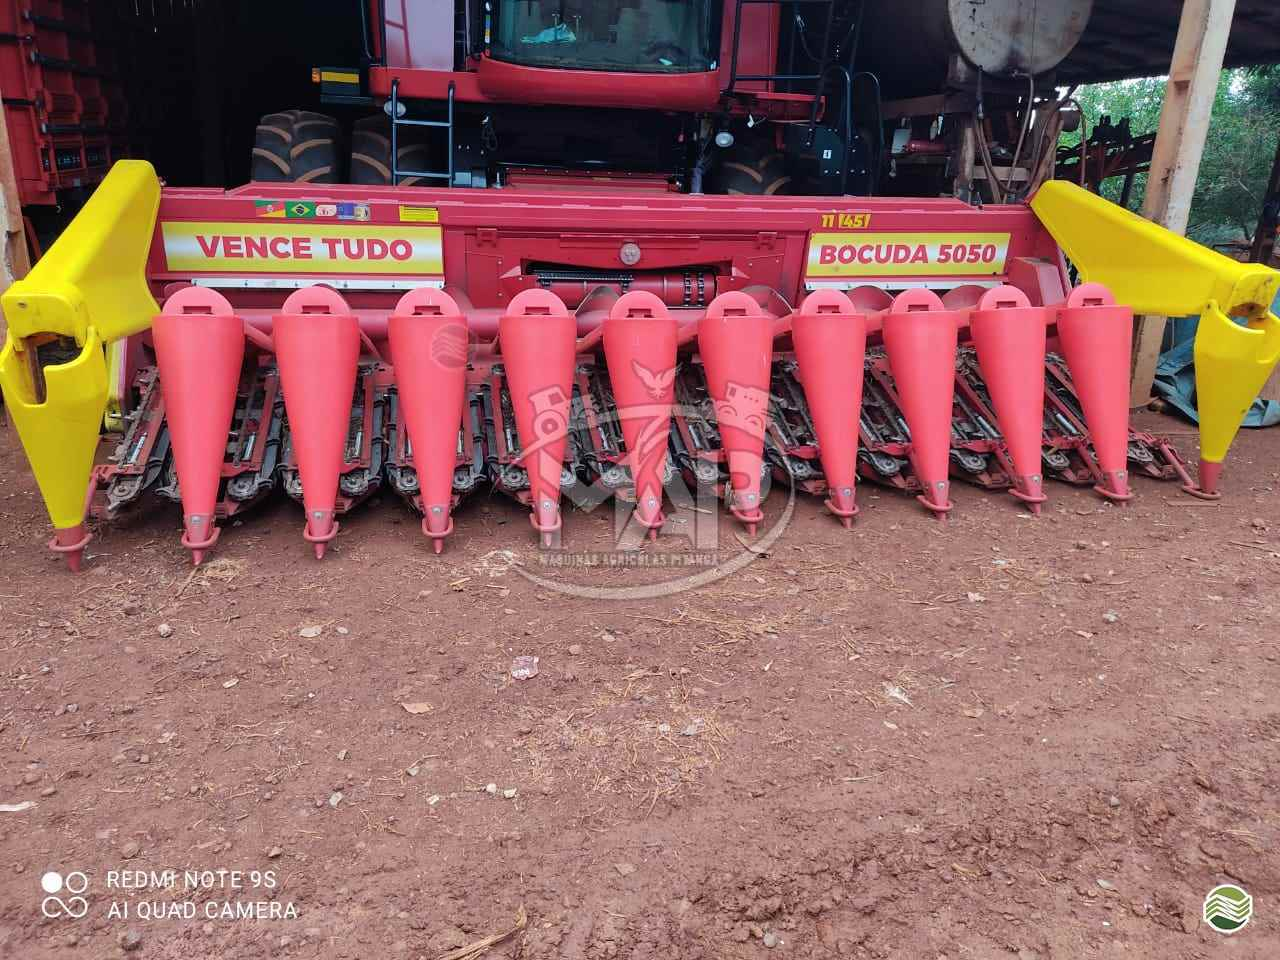 PLATAFORMA COLHEITADEIRA VENCE TUDO BOCUDA 5050 Máquinas Agrícolas Pitanga PITANGA PARANÁ PR